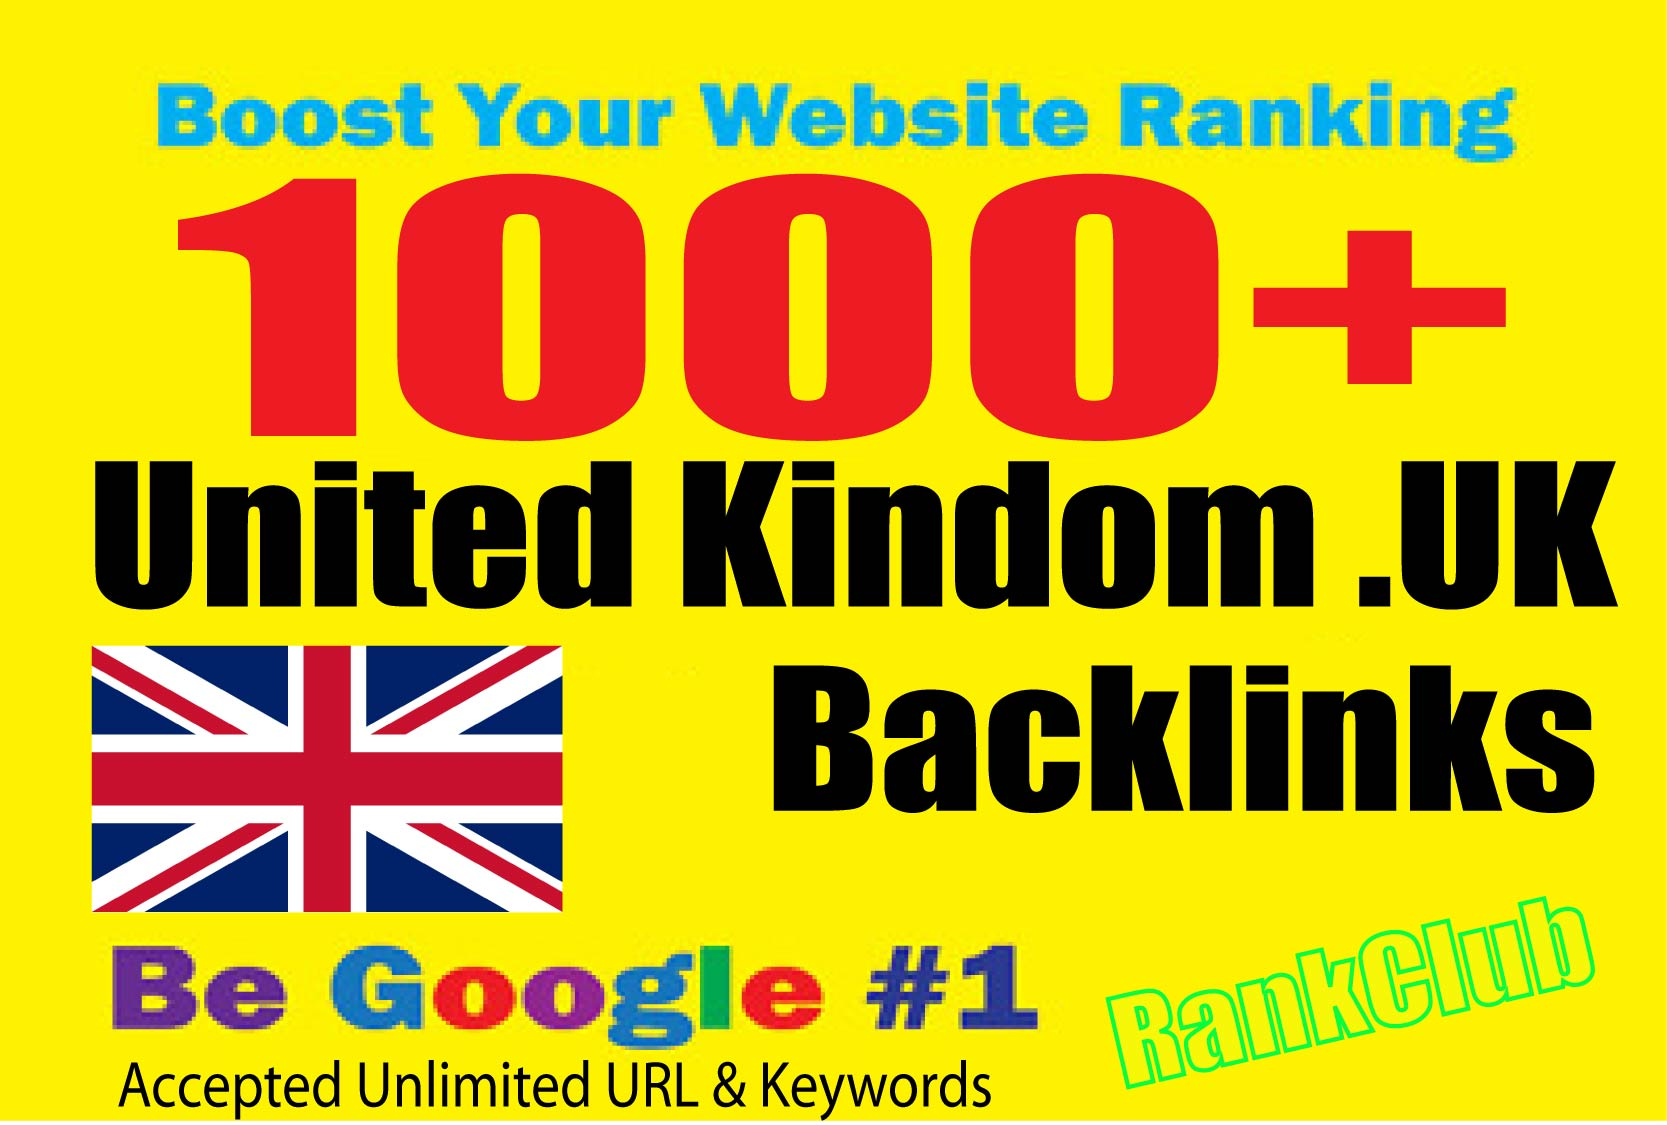 create 1000+ United Kingdom. UK Backlinks From Local UK domains